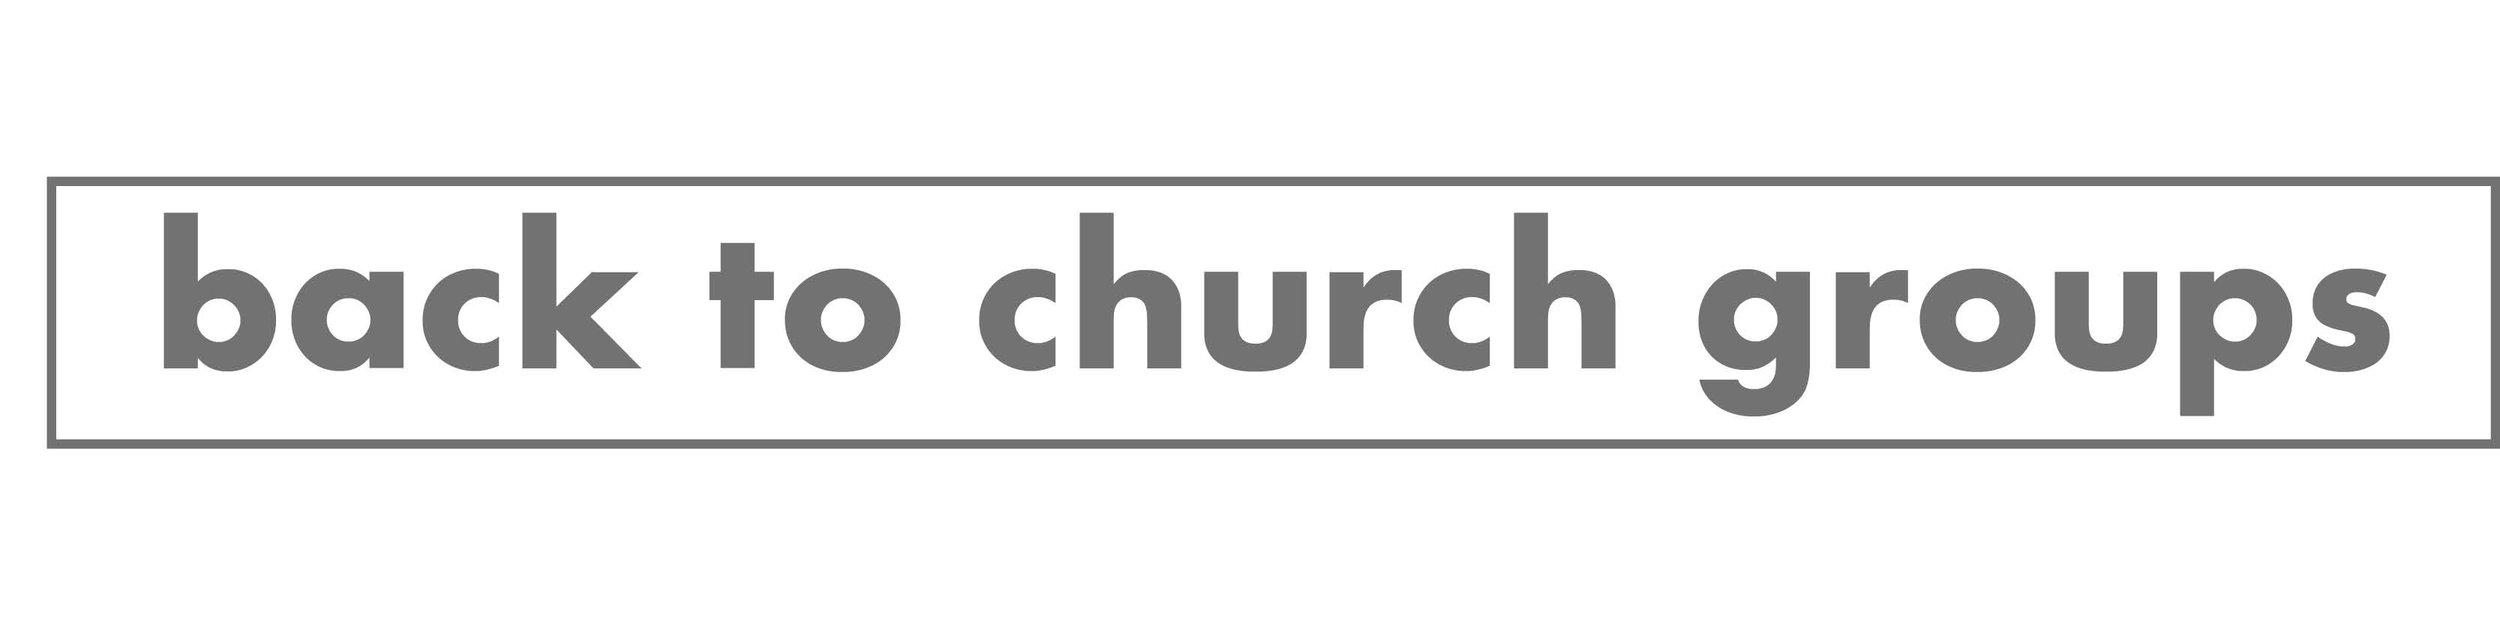 back to church groups.jpg